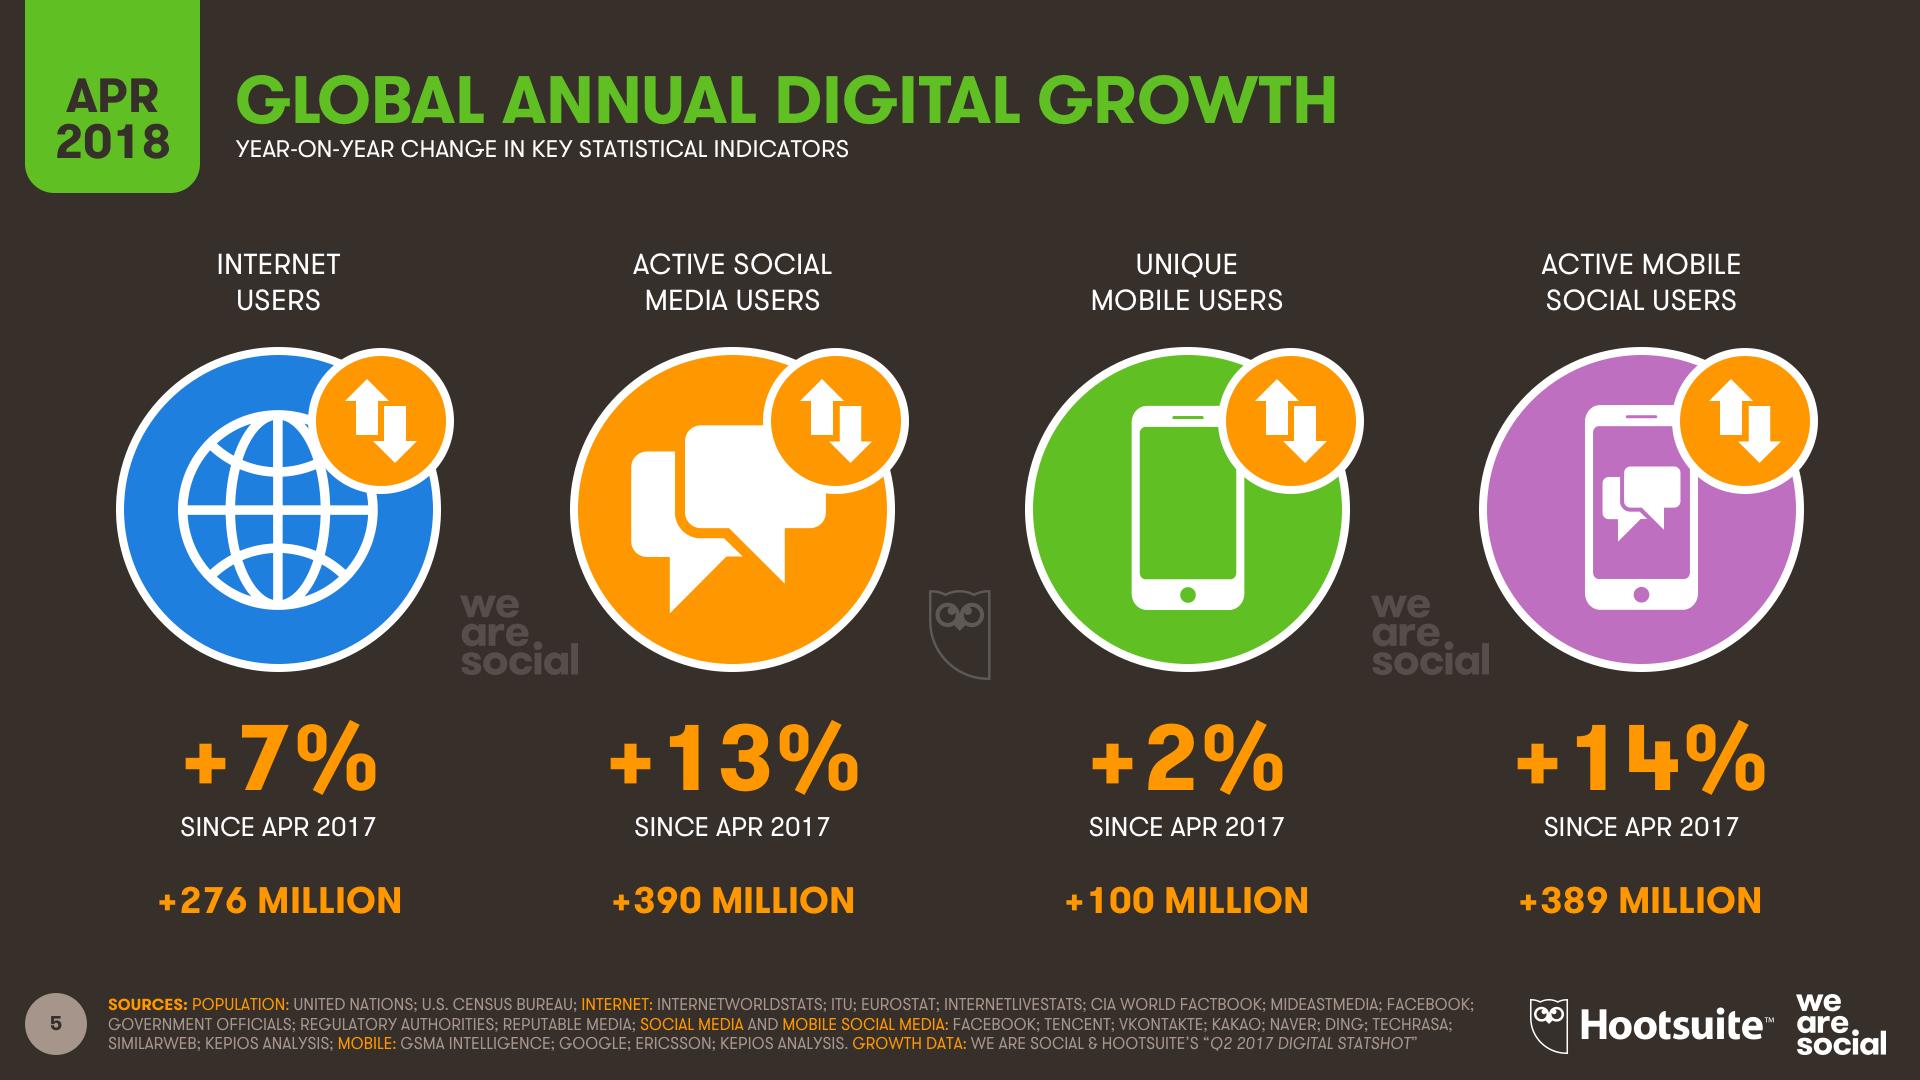 Annual Digital Growth April 2018 DataReportal